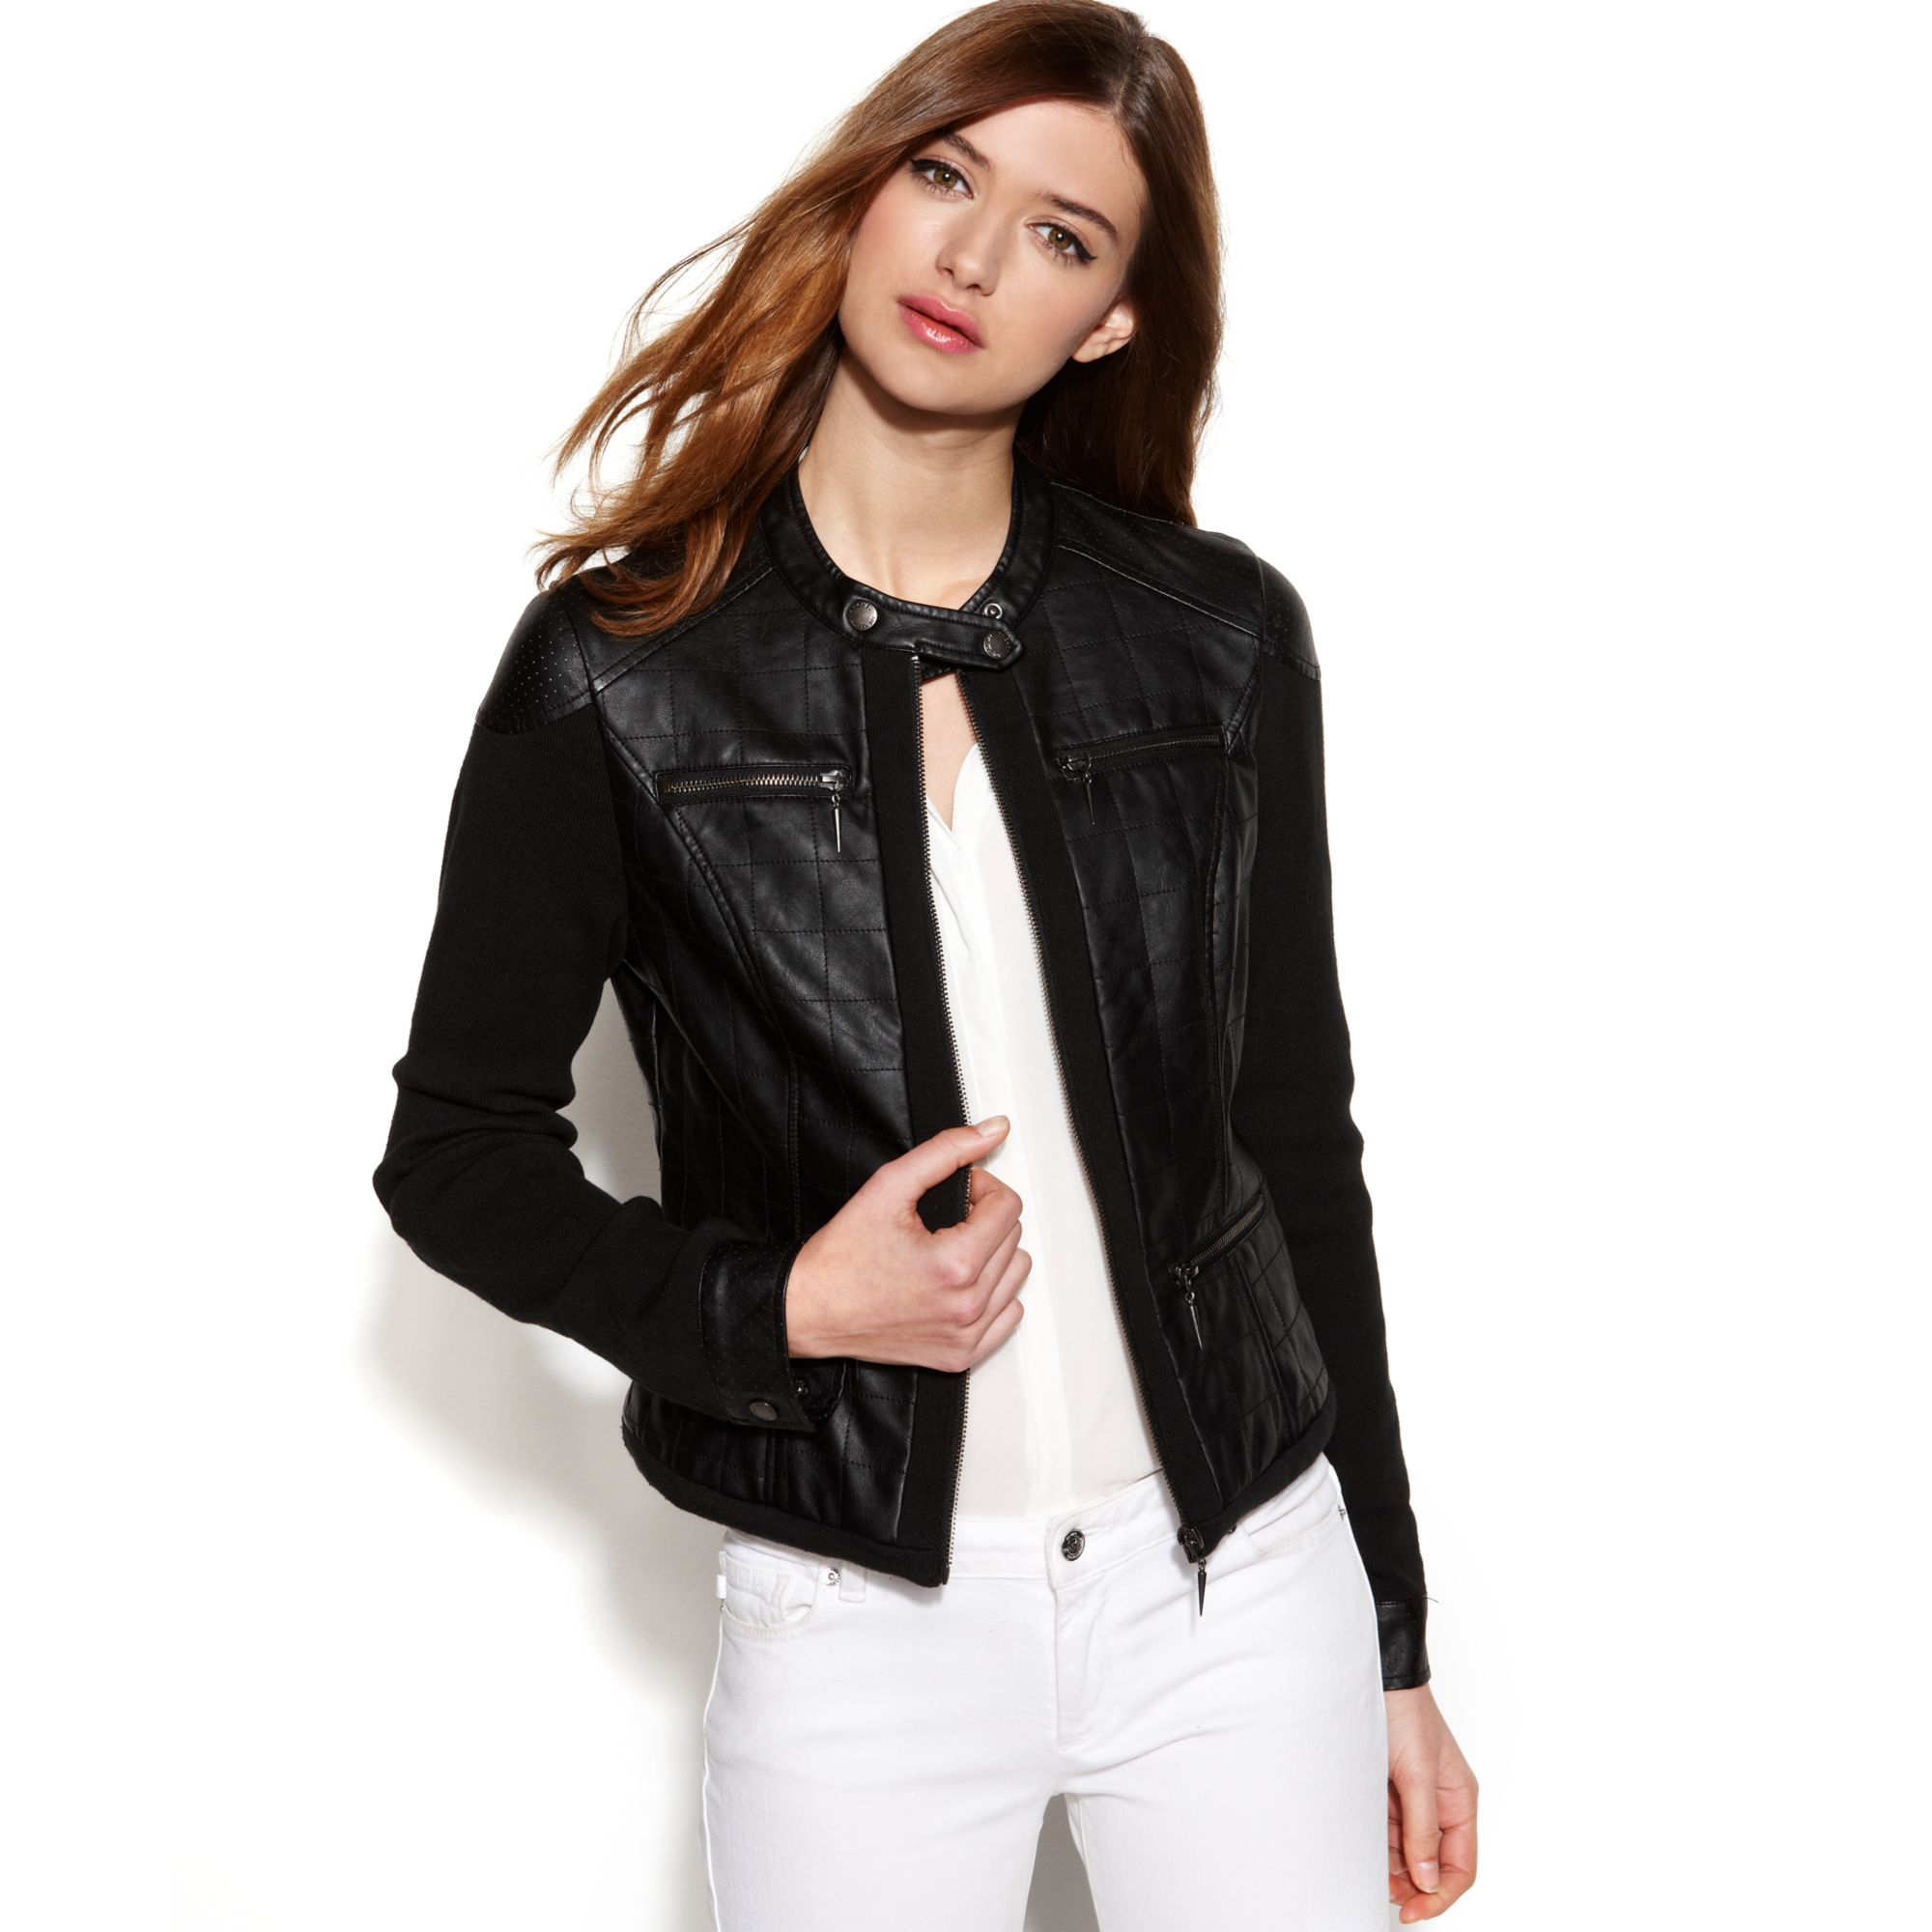 4018f9f0ed574 RACHEL Rachel Roy Quilted Mixedmedia Fauxleather Jacket in Black - Lyst